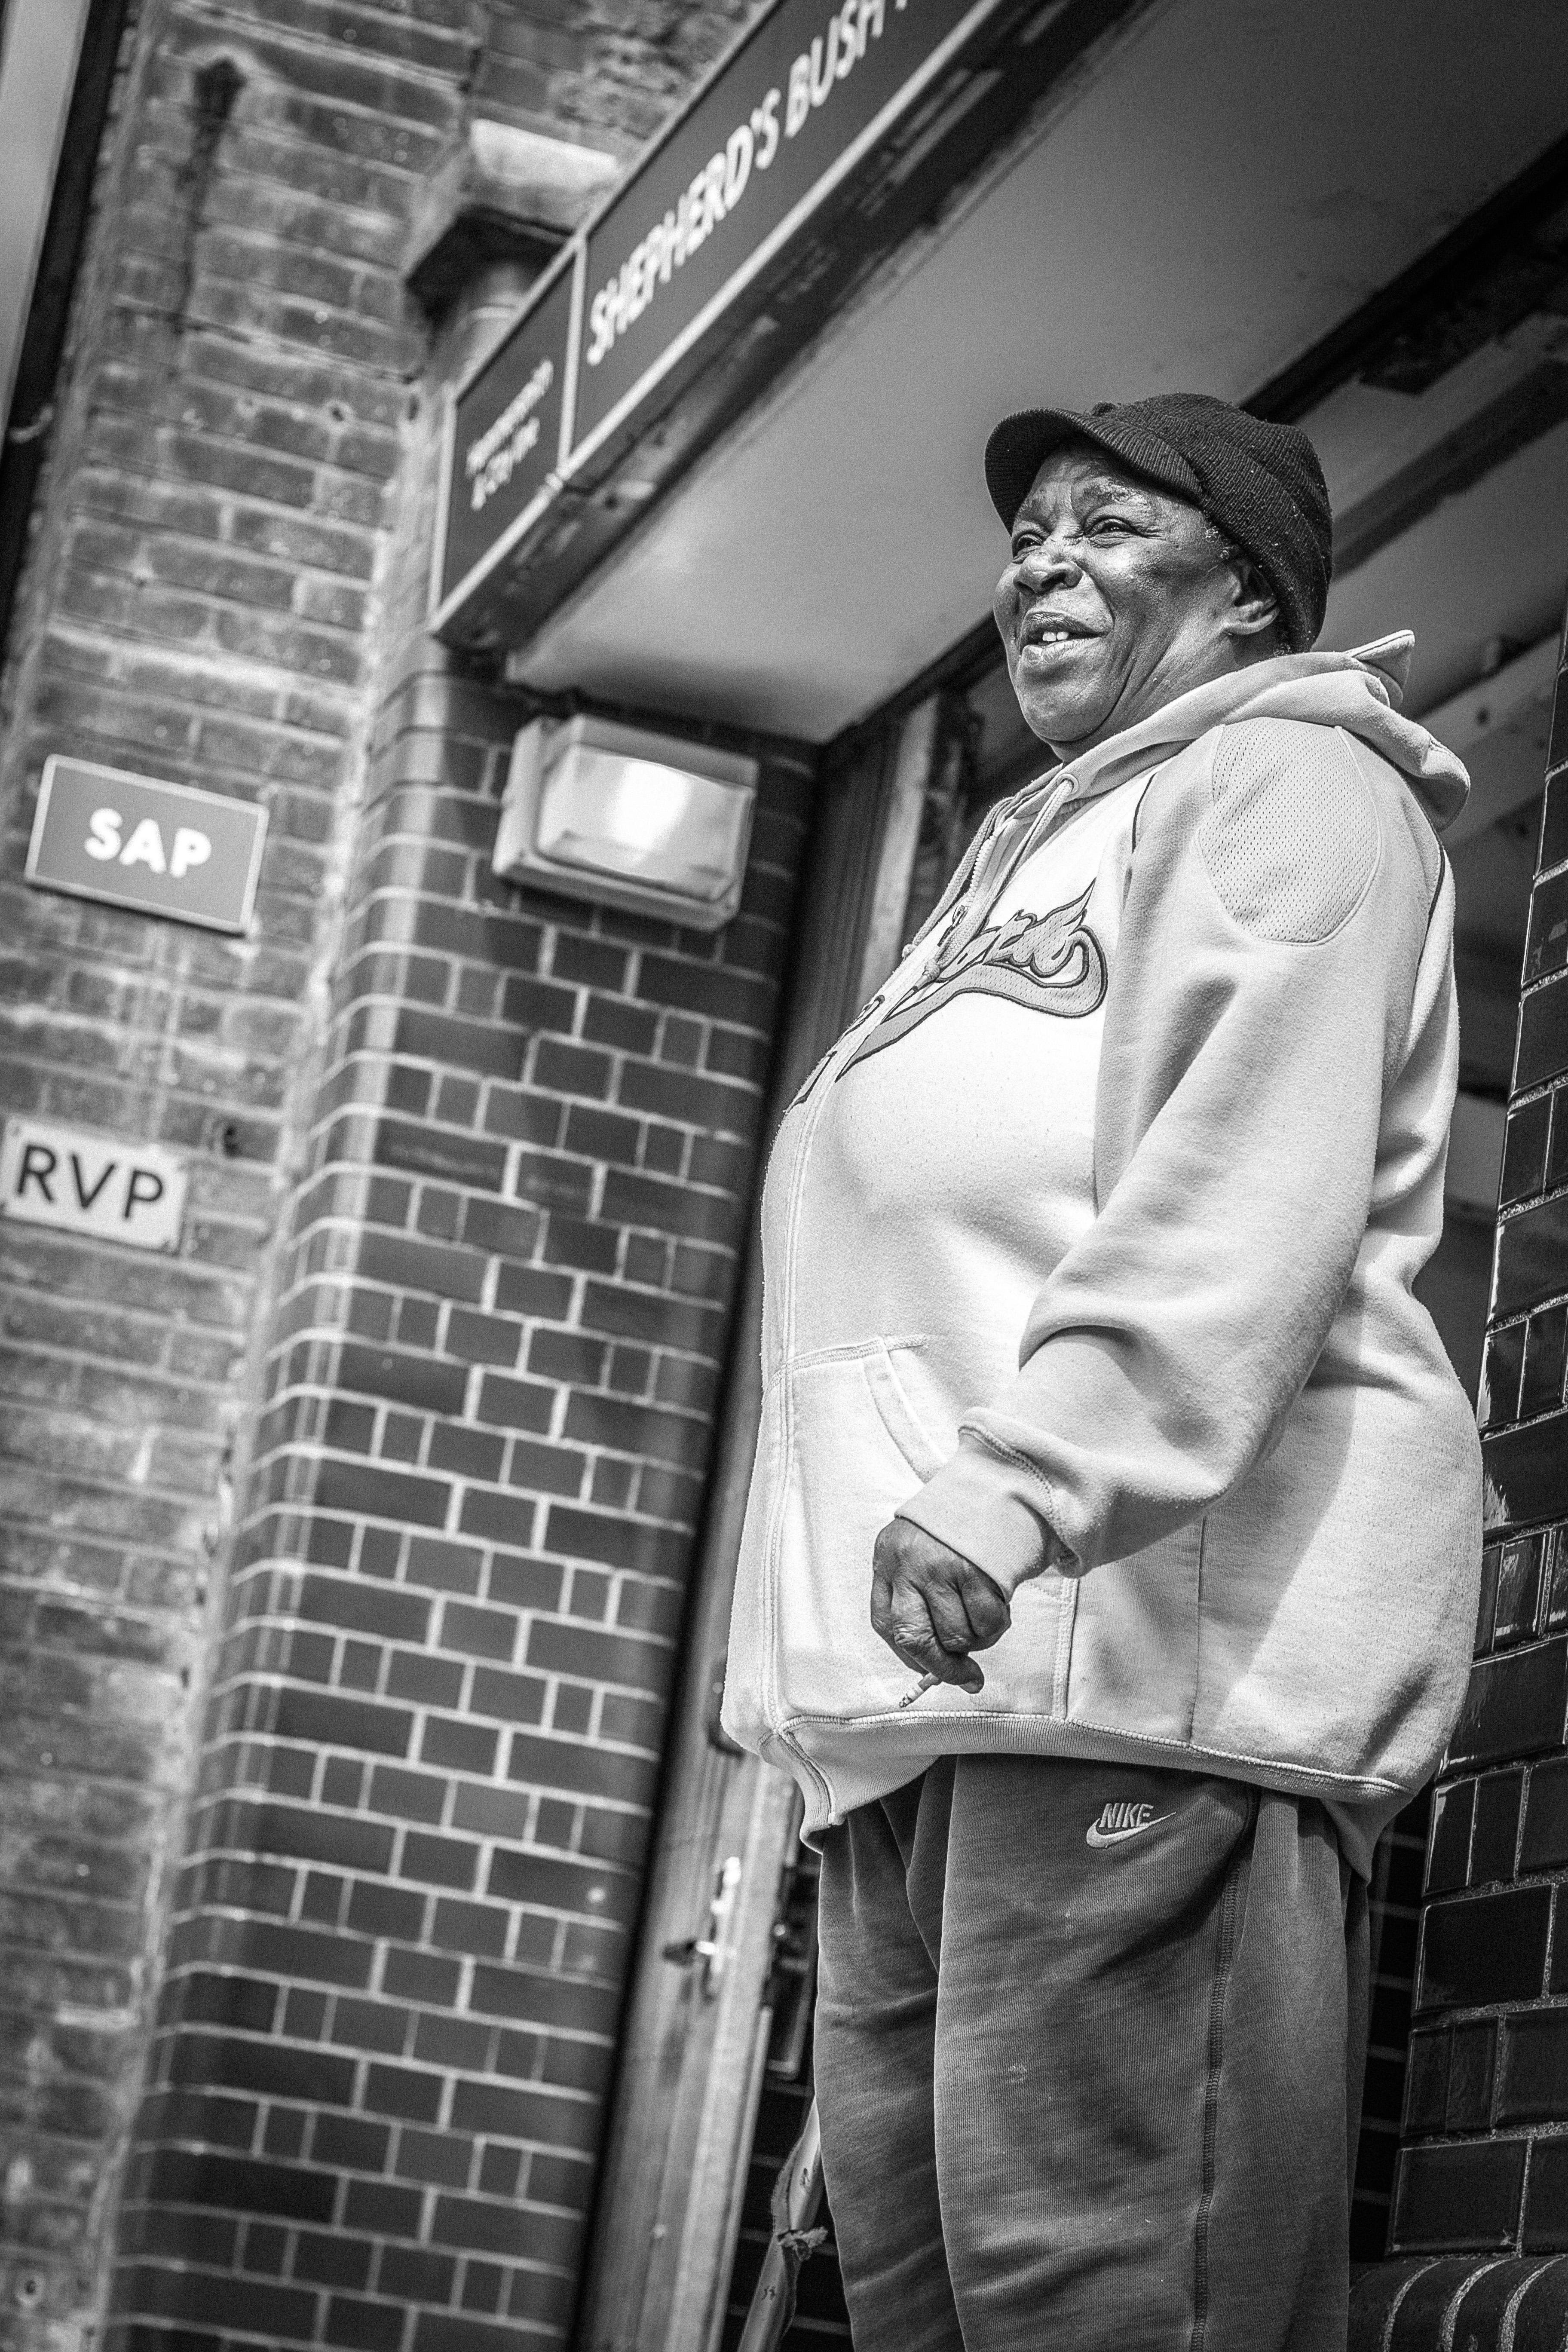 London Street Photography 01